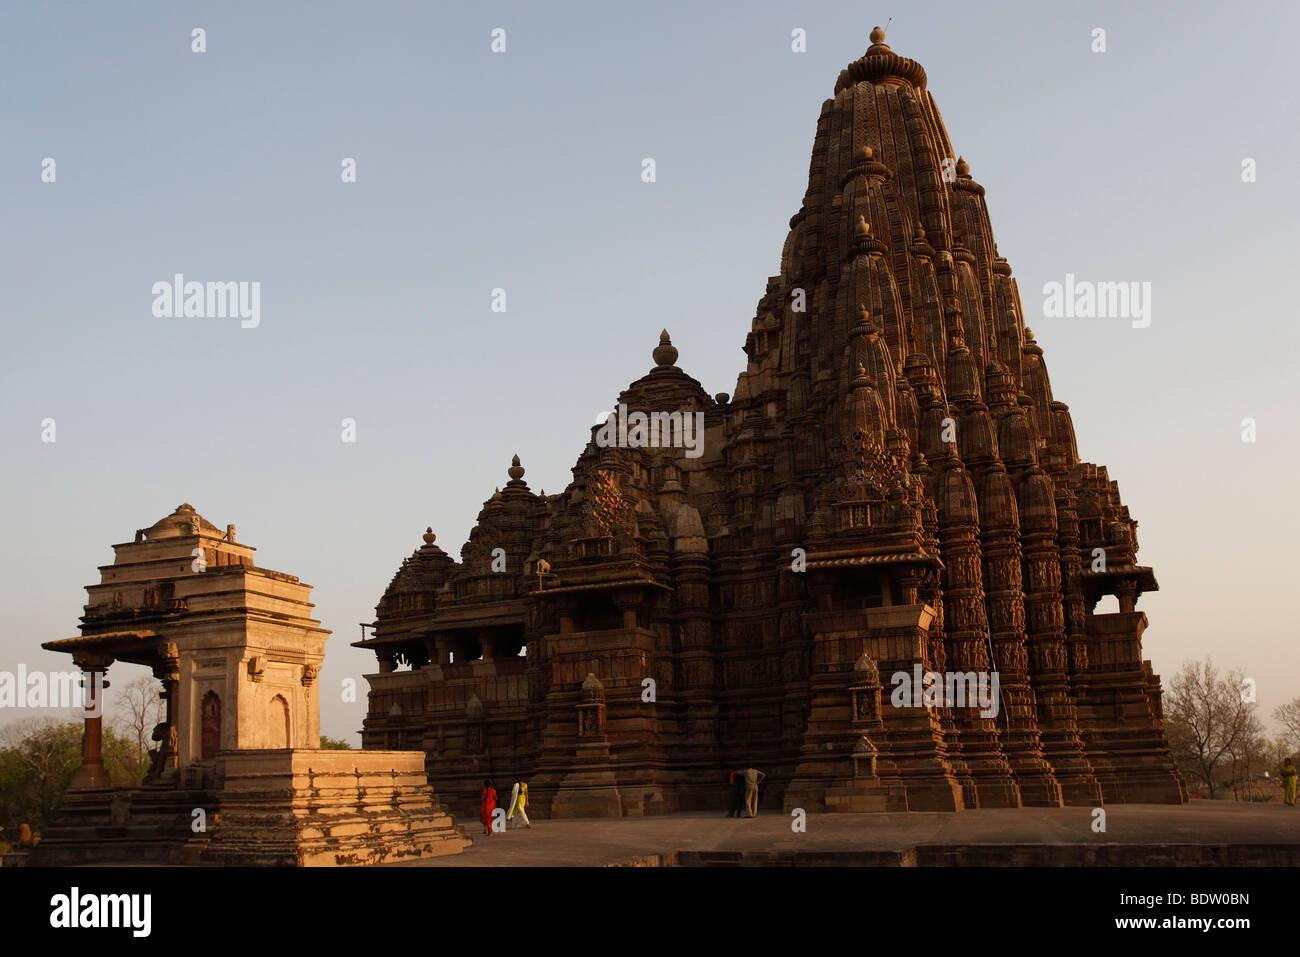 Tempel von Khajuraho, Indien, Tempel in Indien, Stockbild